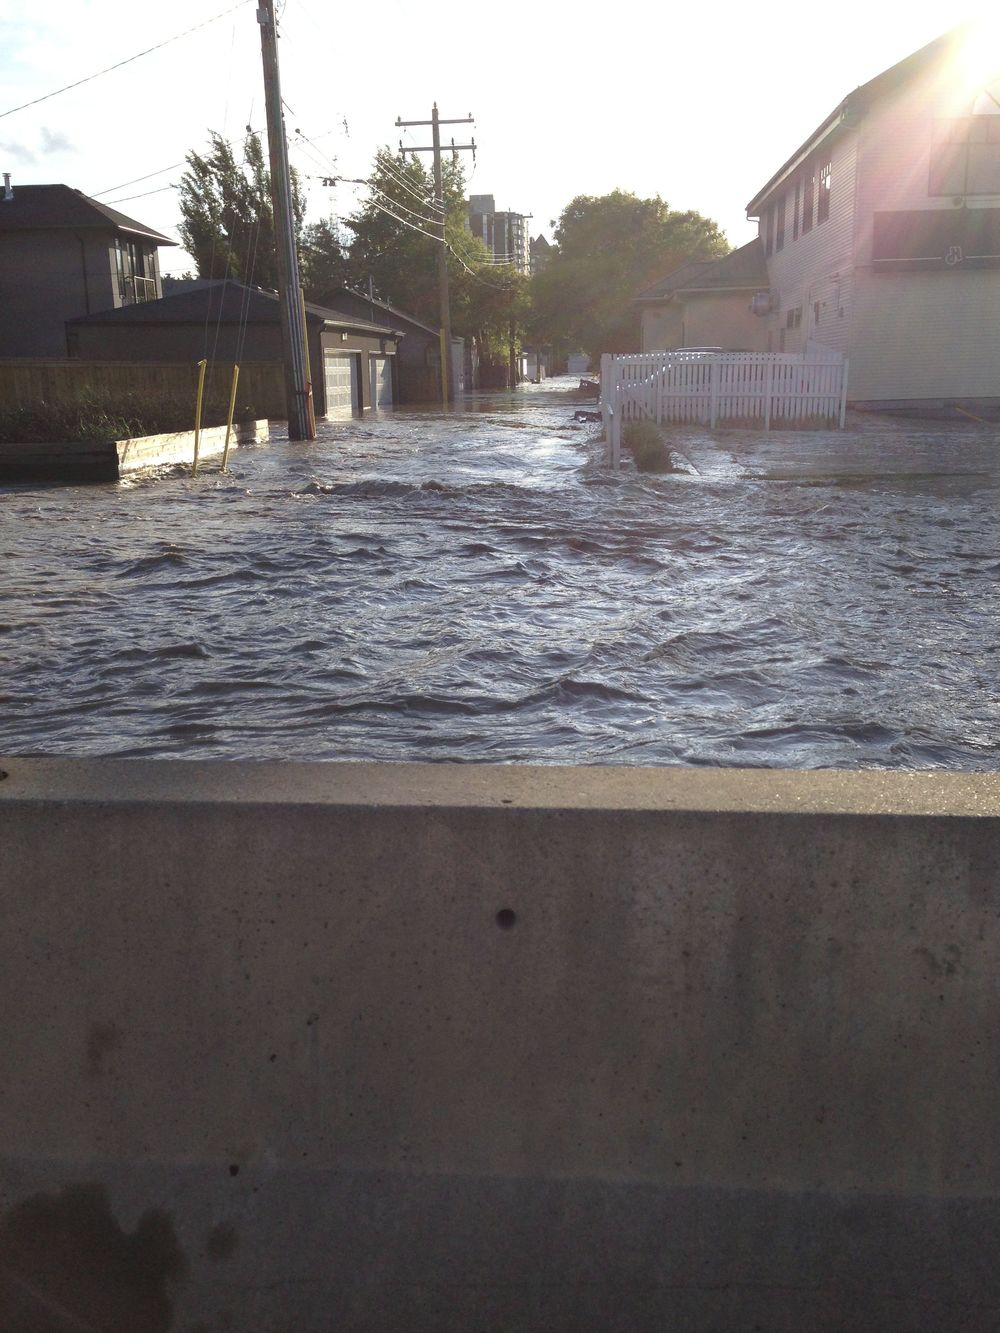 Calgary flood pictures, general contractor Calgary, renovations, restoration company, contractor Calgary 11.jpg